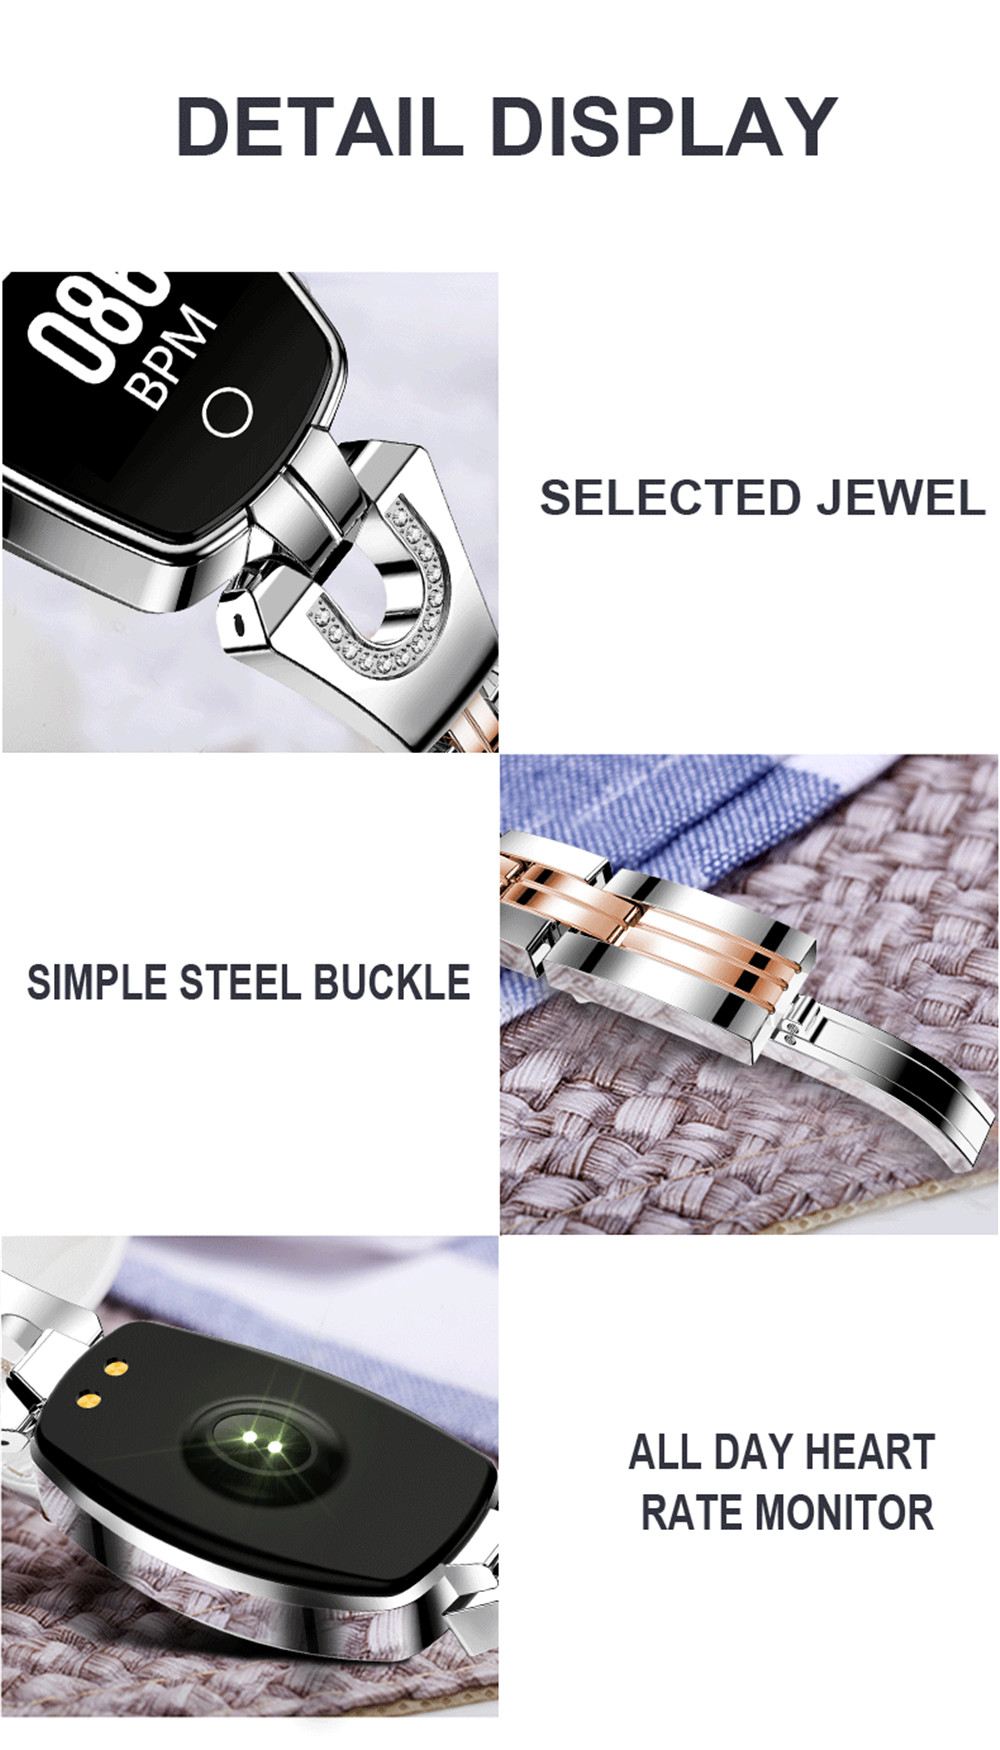 HTB1kQZwXErrK1RkSne1q6ArVVXaM Greentiger H8 Smart Bracelet Women Activity Fitness Tracker Heart Rate Monitor Blood Pressure IP67 Waterproof Smart Wristband